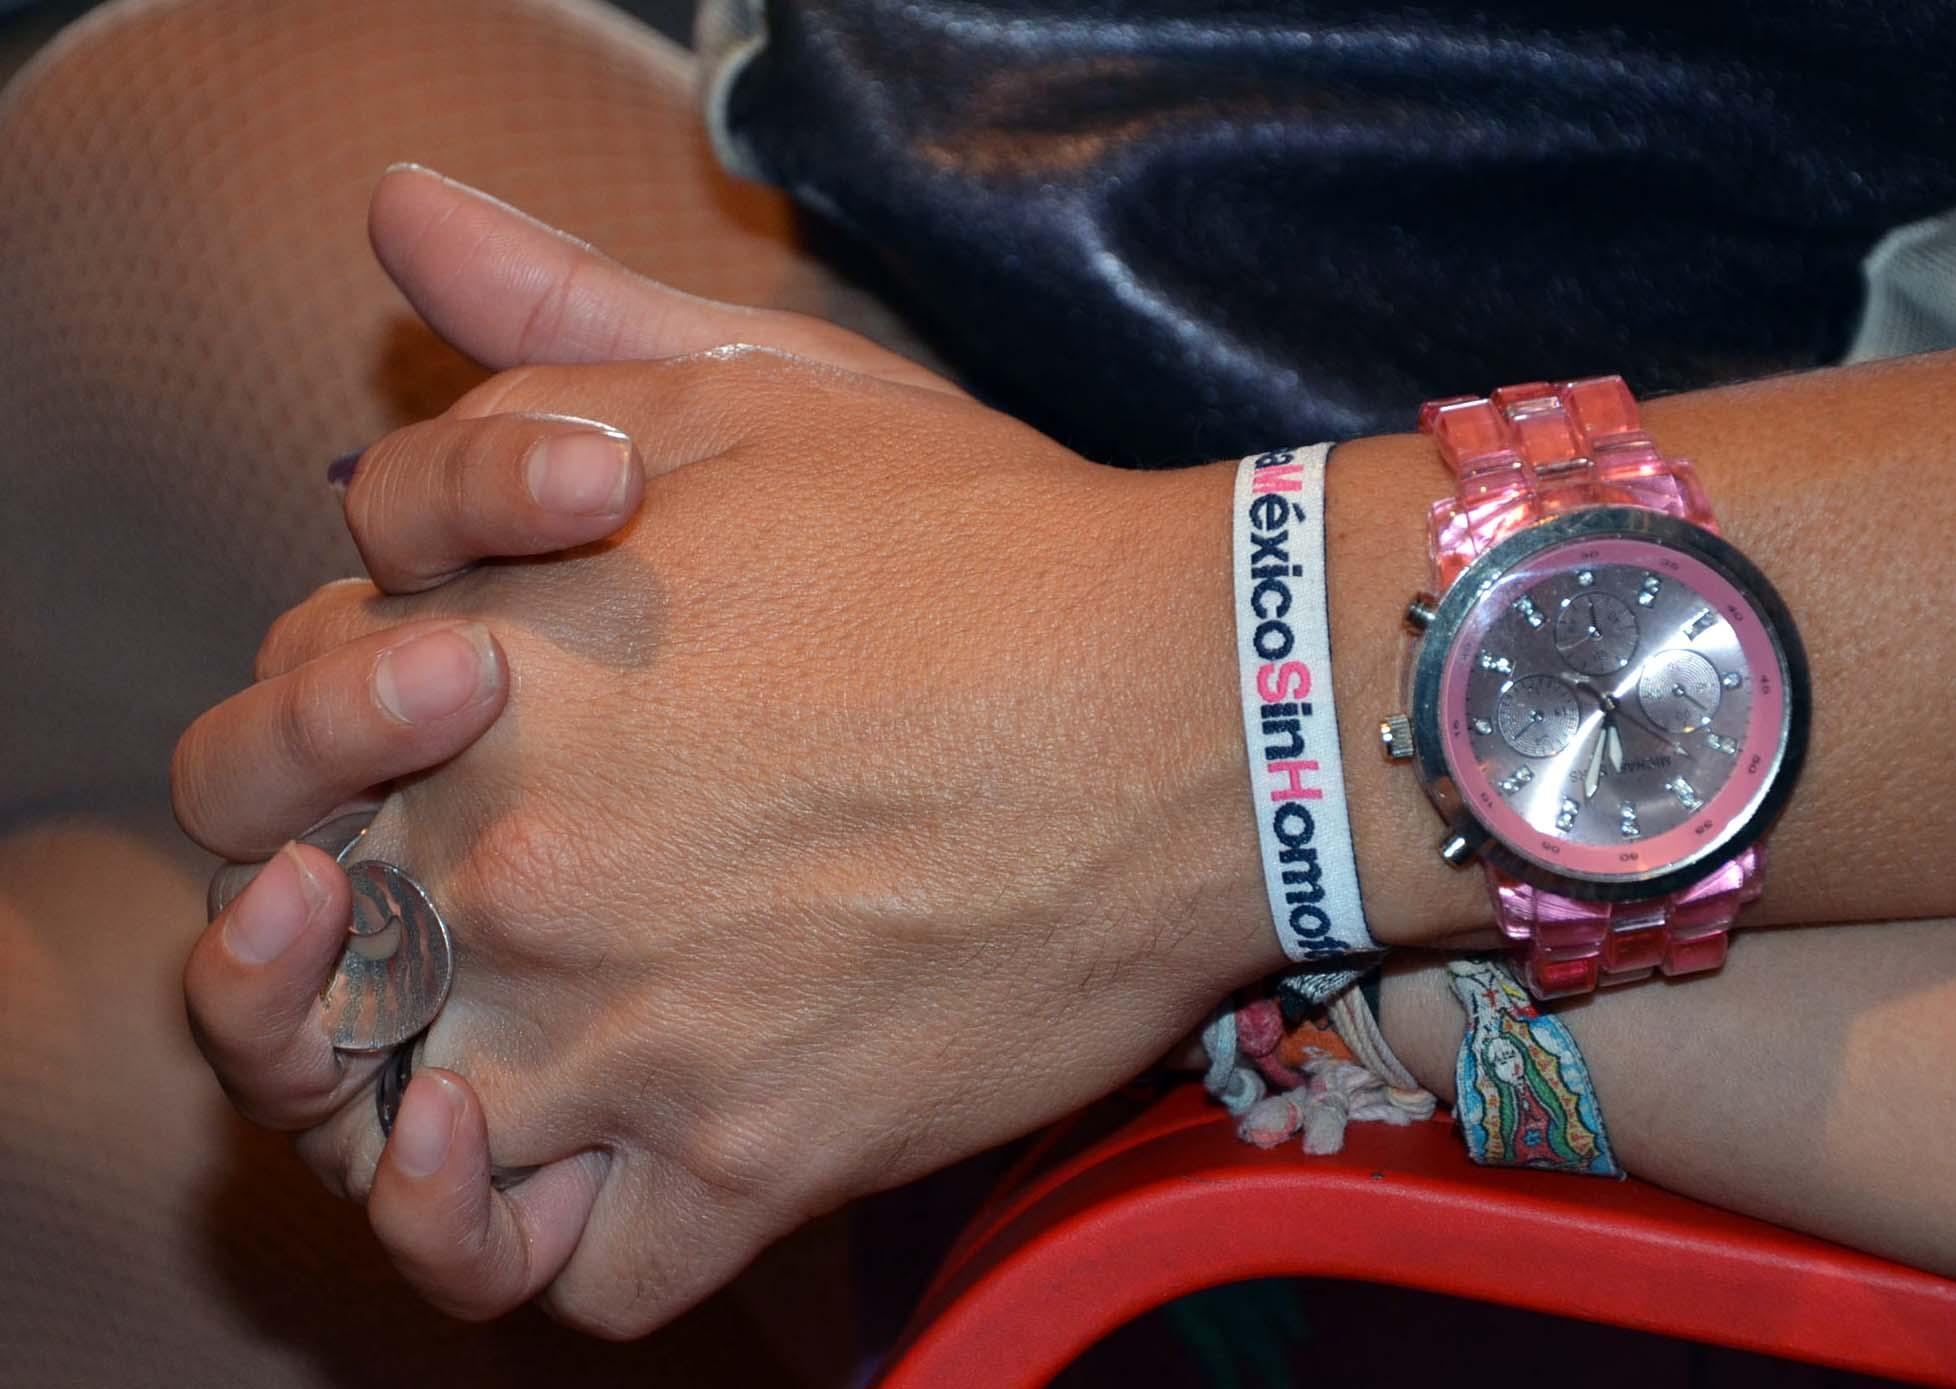 Arranca la campaña reacciona México sin homofobia